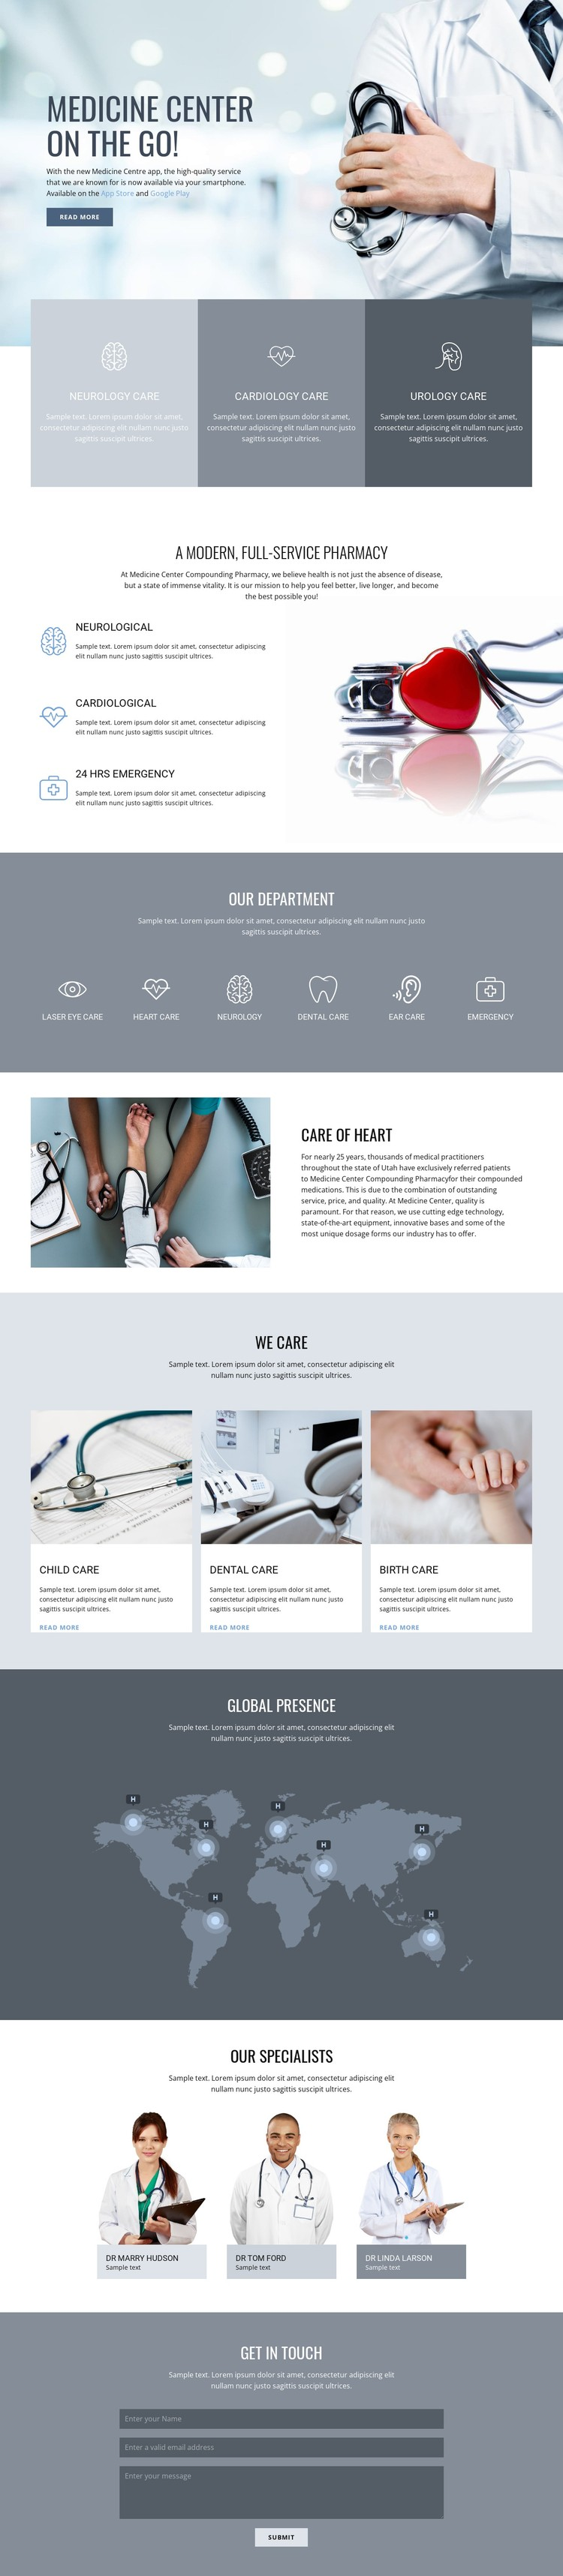 Pharmacy and medicine Static Site Generator